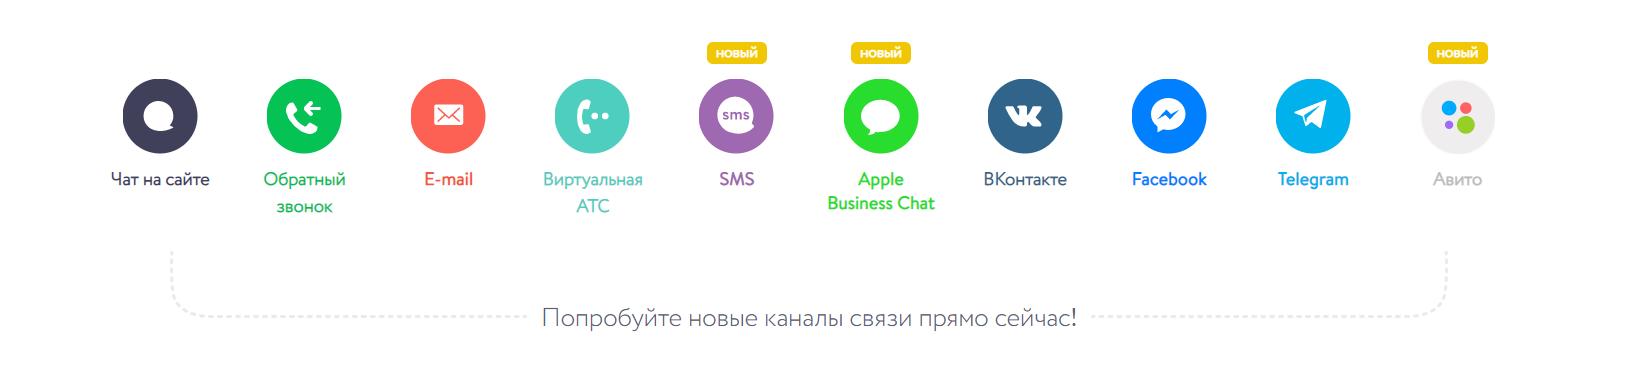 Screenshot 5 e1587480214350